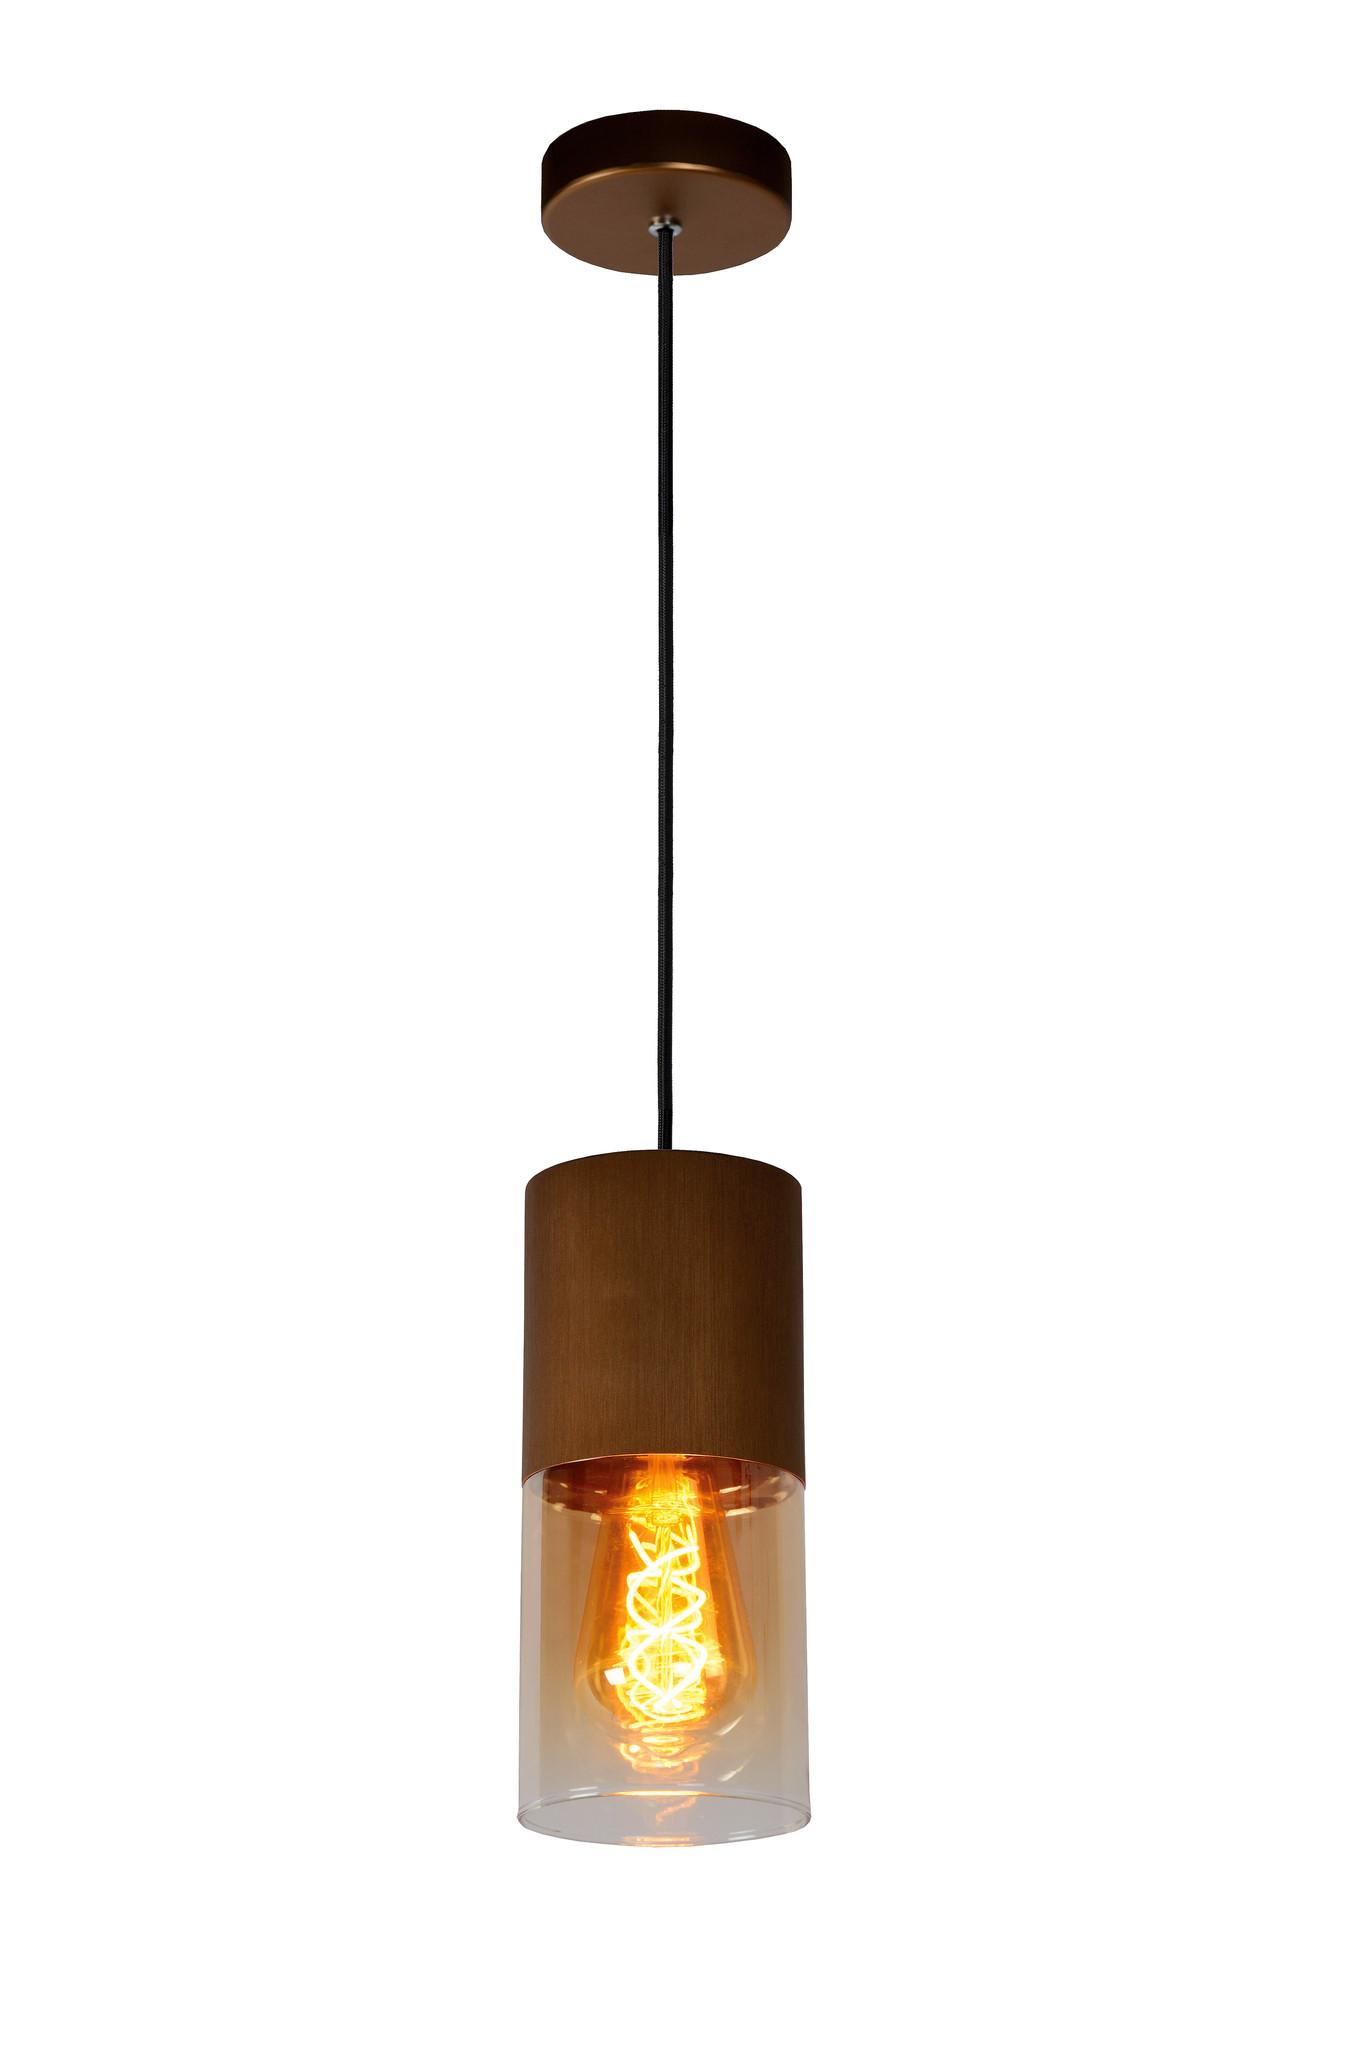 Lucide ZINO Hanglamp-Amber-Ø10-1xE27-60W-Glas